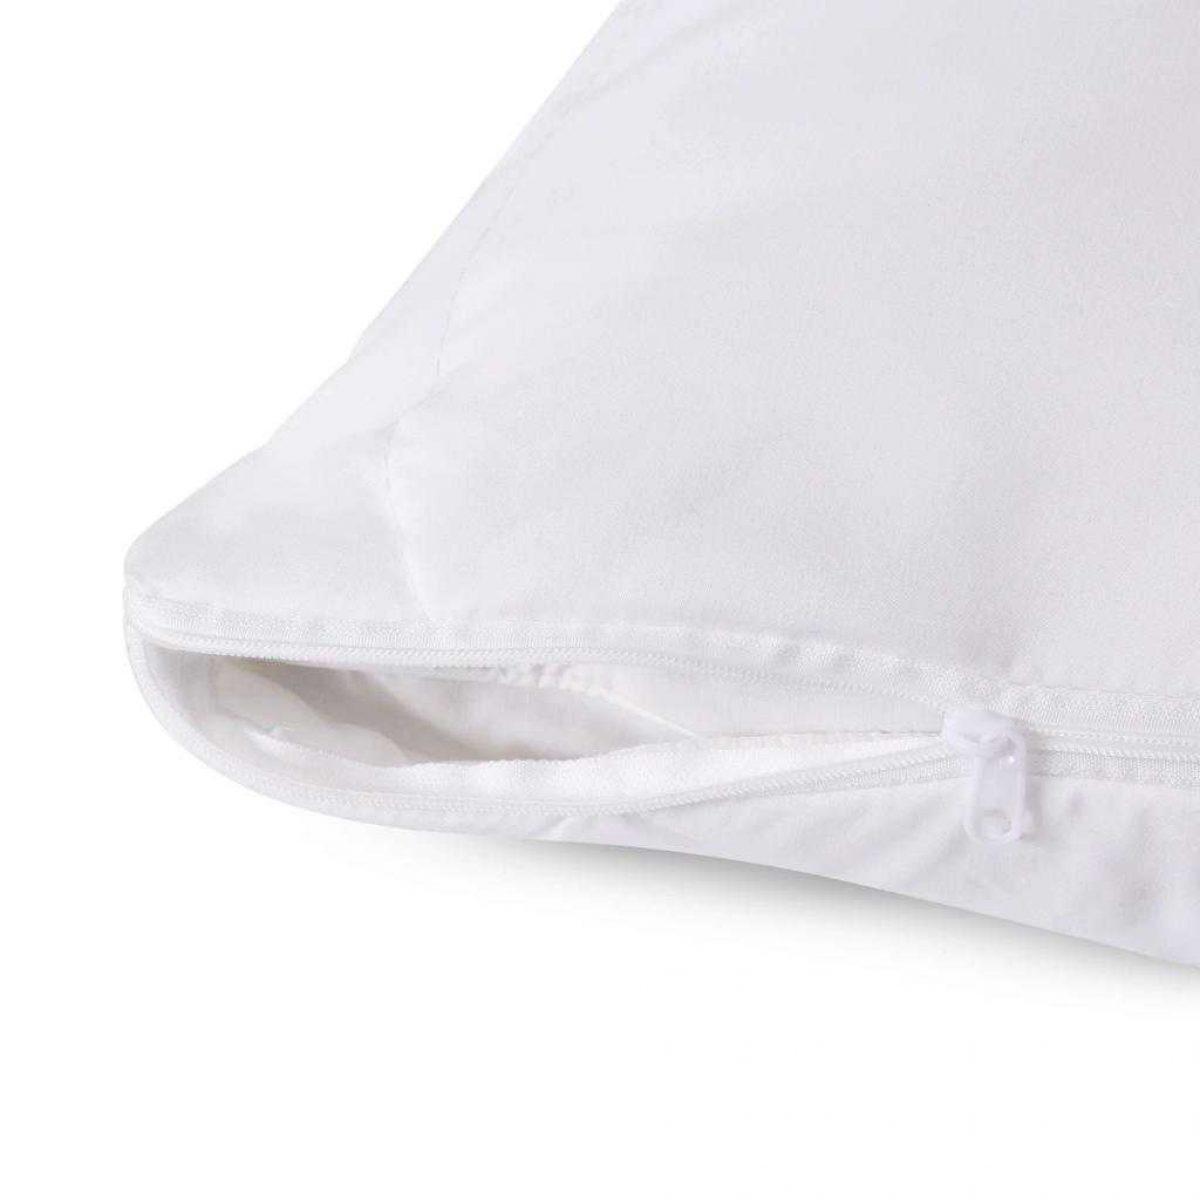 Fine Bedding Spundown Pillow Protector Detail 1024x1024